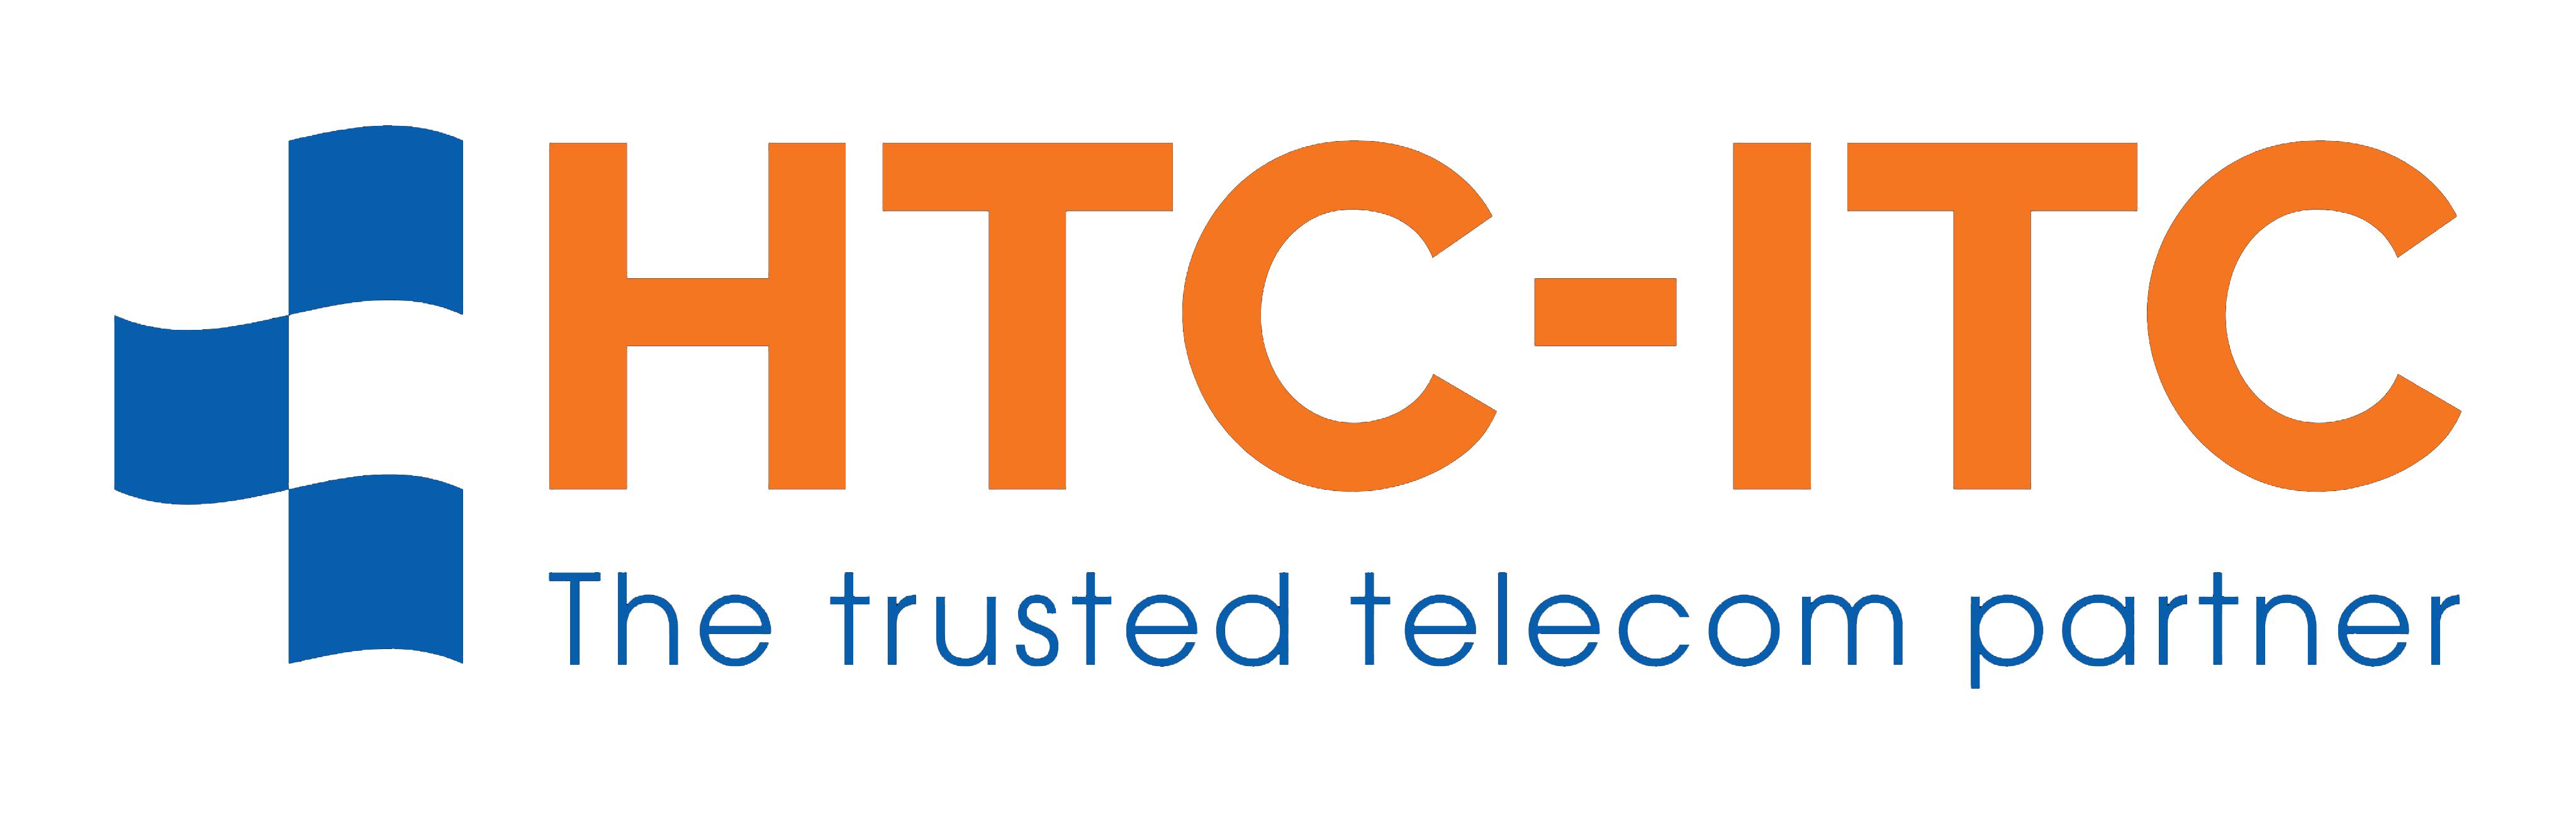 HTC-ITC Telecom